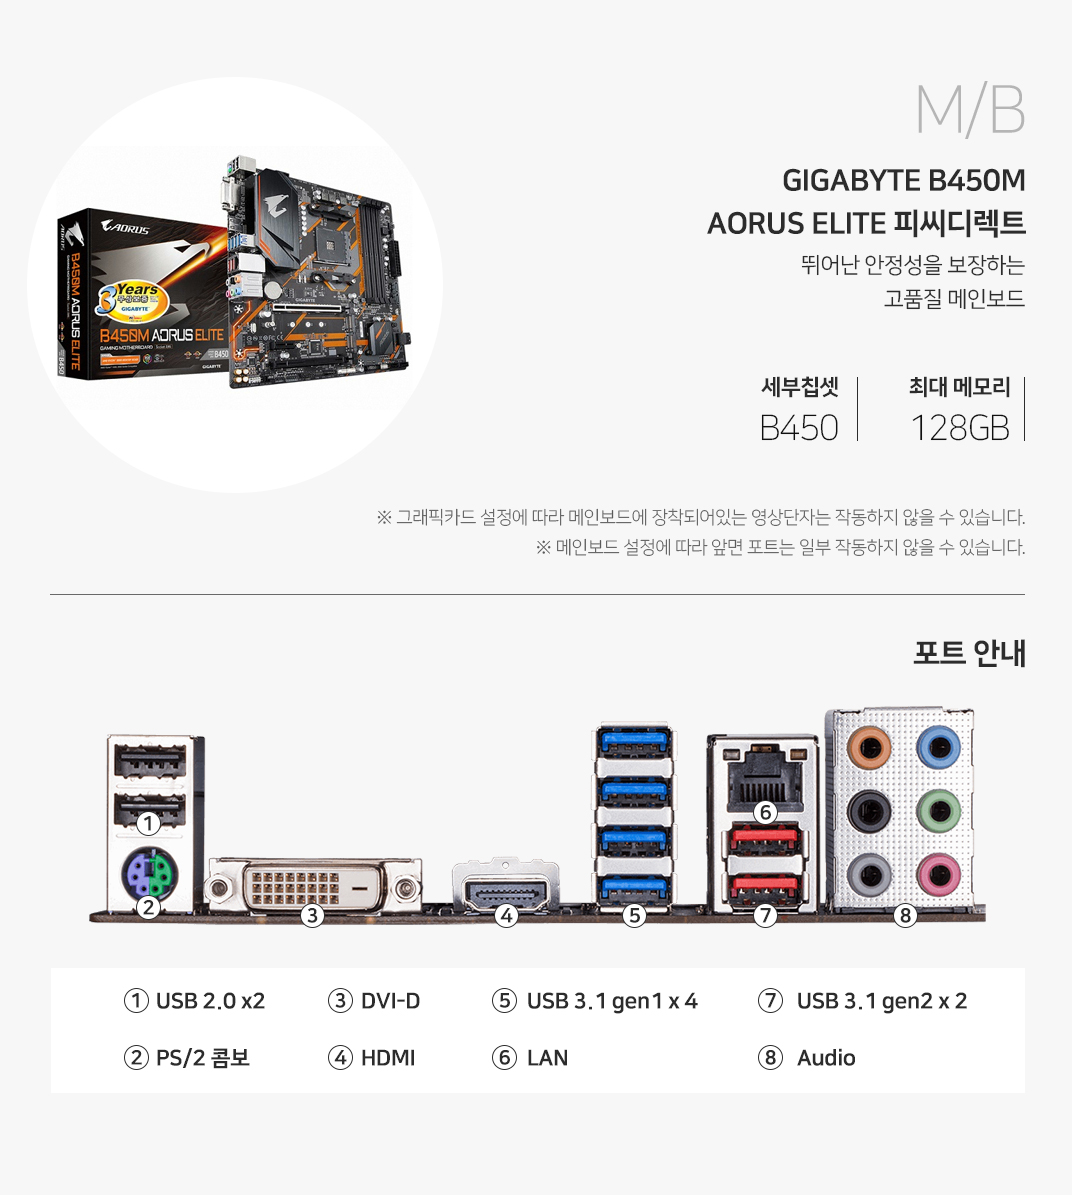 M/B GIGABYTE B450M AORUS ELITE 피씨디렉트 뛰어난 안정성을 보장하는 고품질 메인보드 세부 칩셋 B450 최대 메모리 128GB 그래픽 설정에 따라 메인보드에 장착되어 있는 영상 단자는 작동하지 않을 수 있습니다. 메인보드 설정에 따라 앞면 포트는 일부 작동하지 않을 수 있습니다.